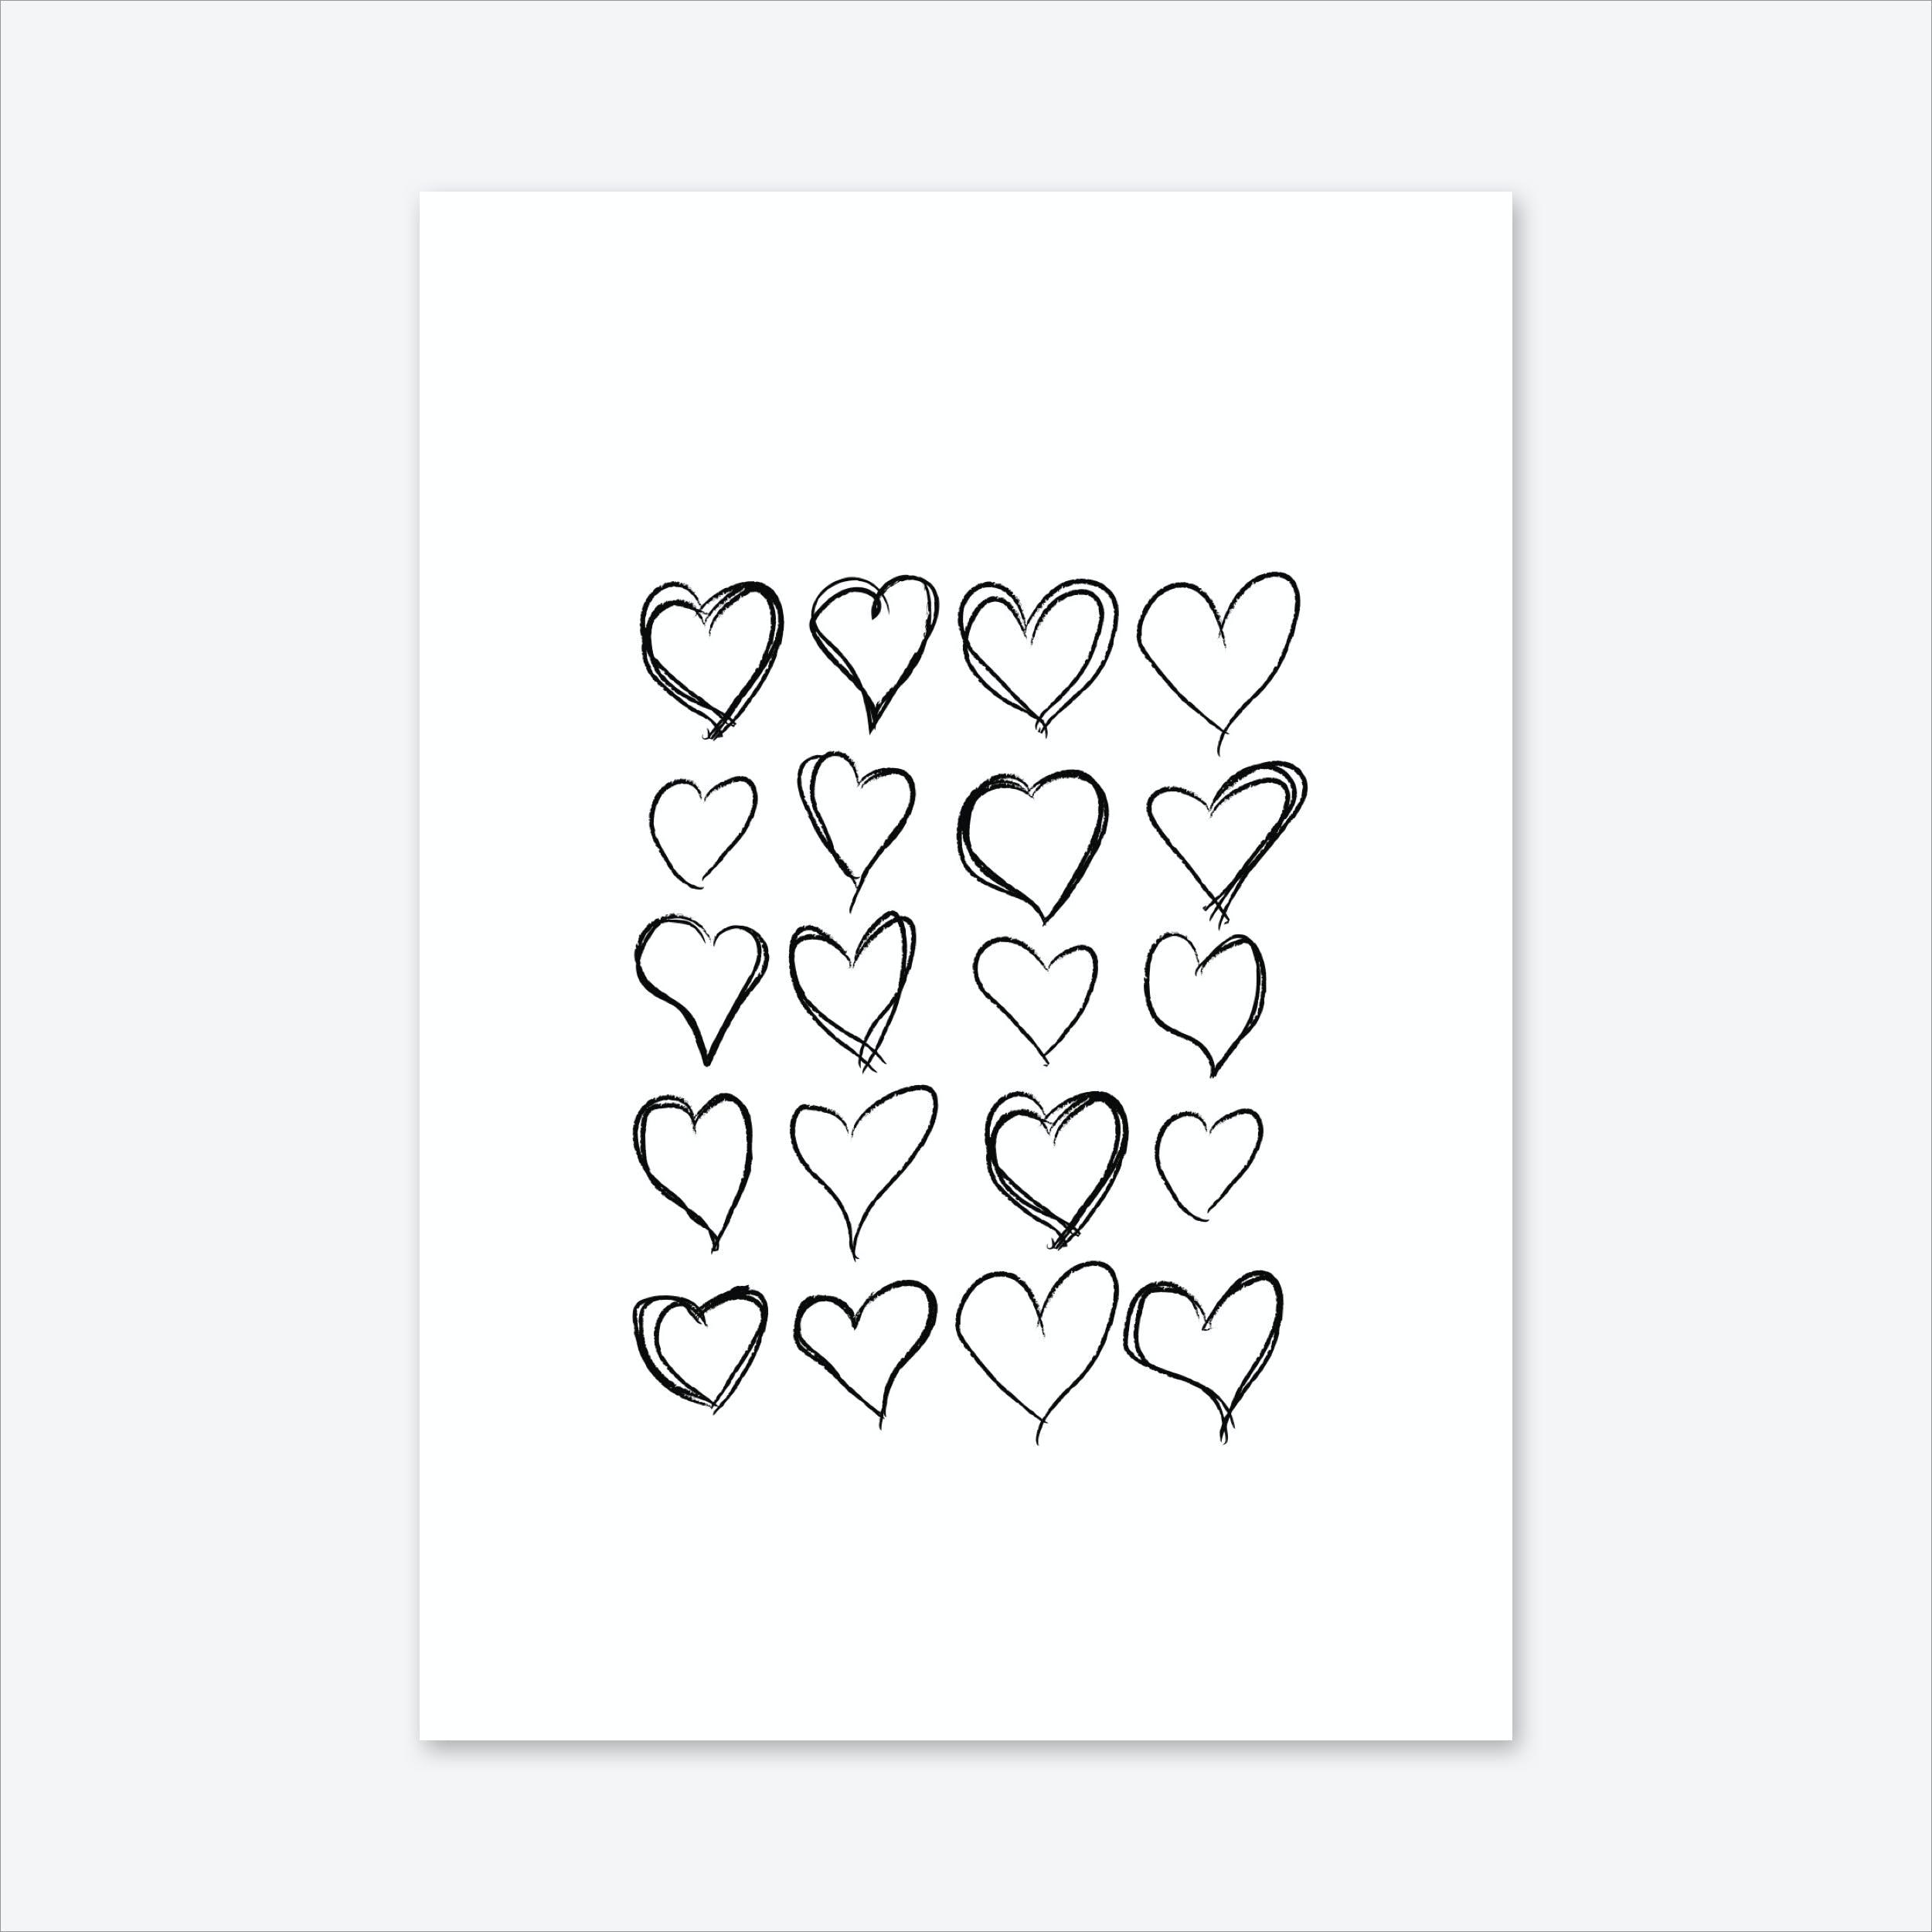 Lovev Hearts Art Print